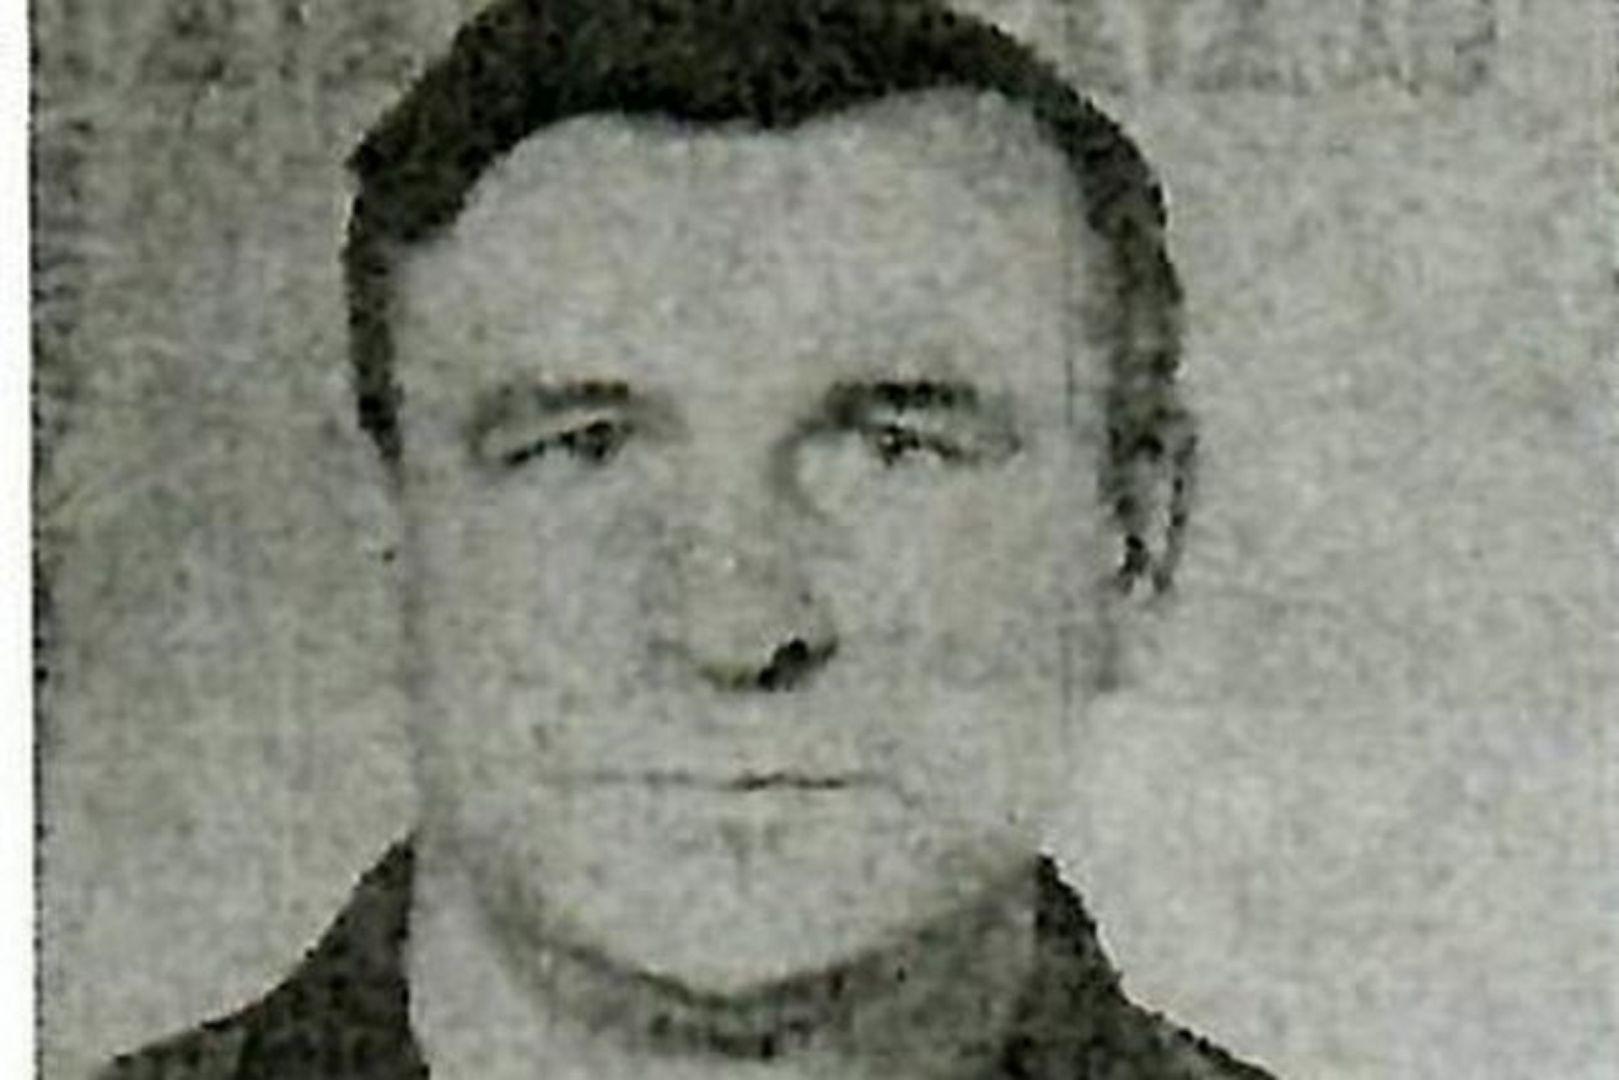 знакомства ставропольском крае мужчины кому за 55